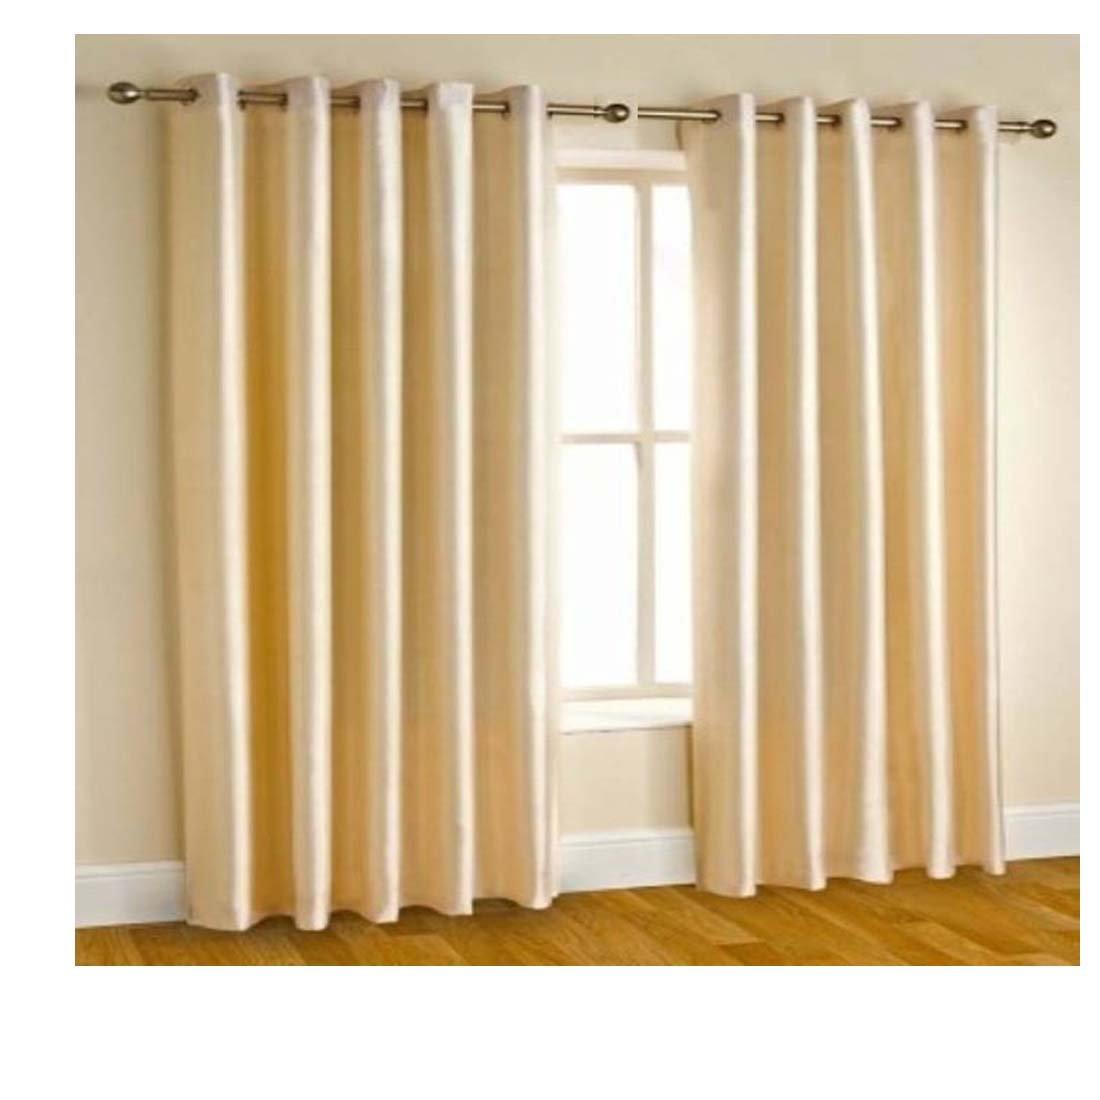 Av Creations Cream Plain Polyester Eyelet 5 Feet Window Curtains Set Of 2 152 X 122 Cm